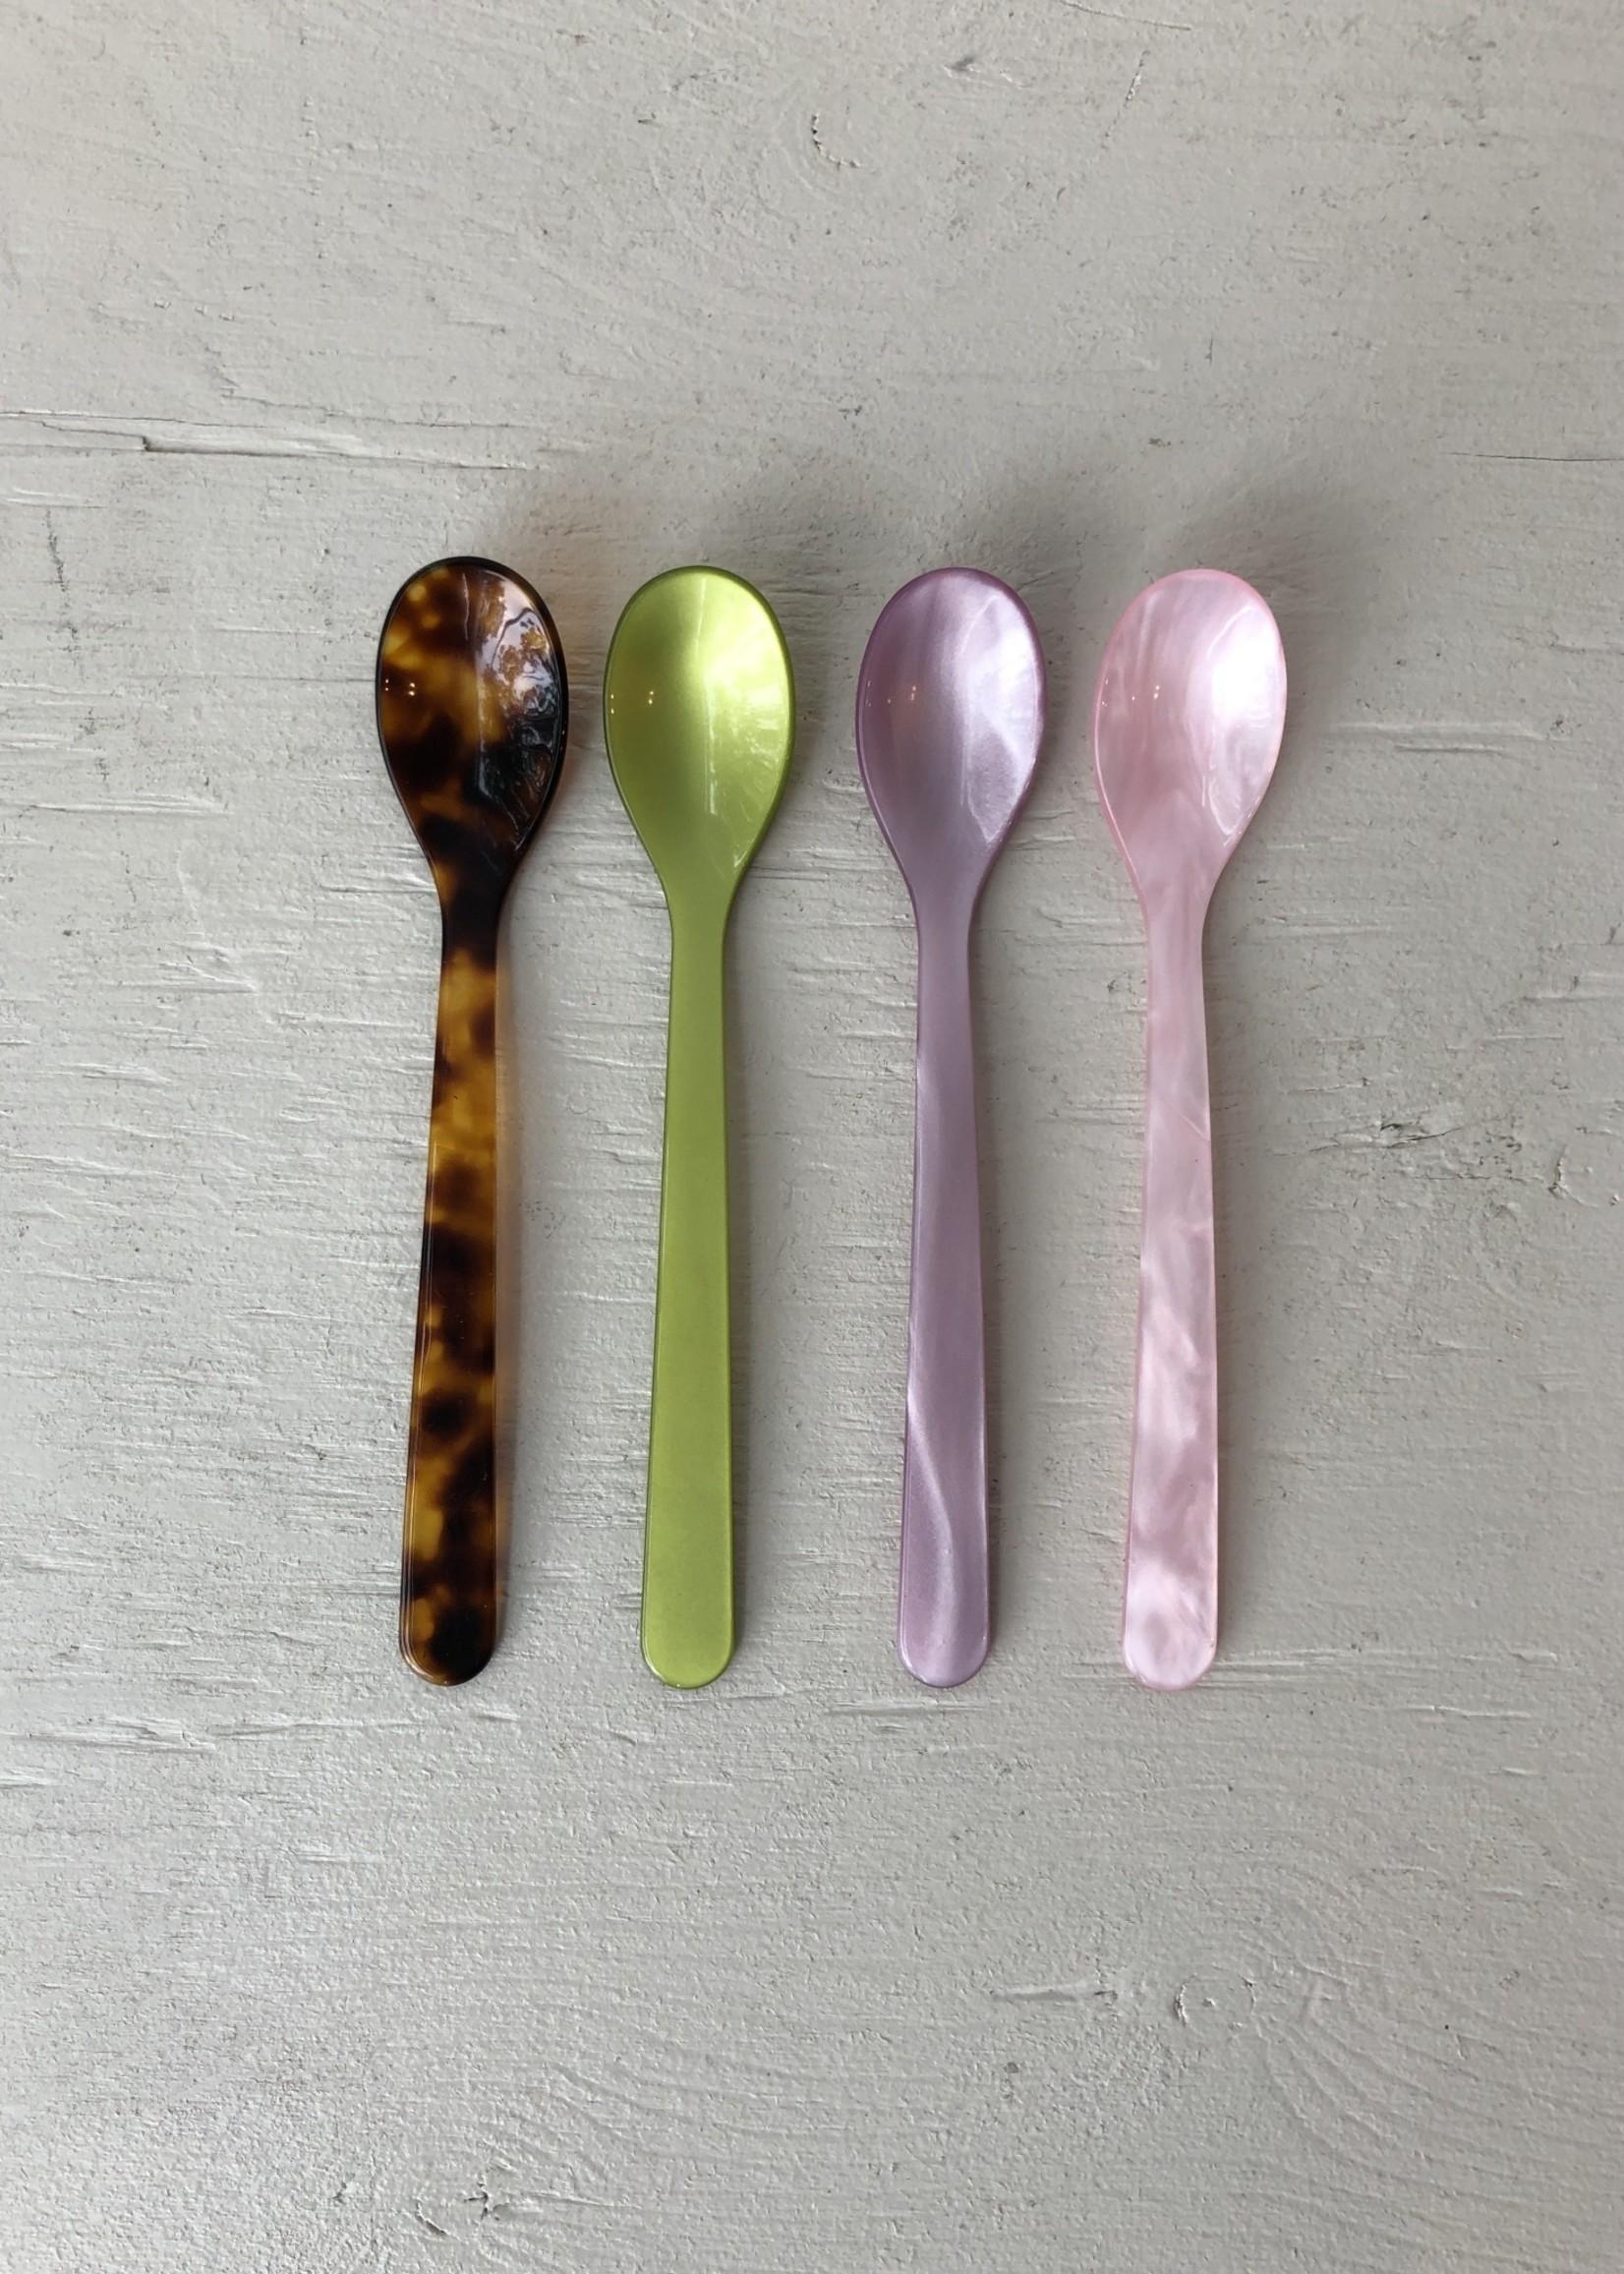 Heim Sohne Table Spoons by Heim Söhne